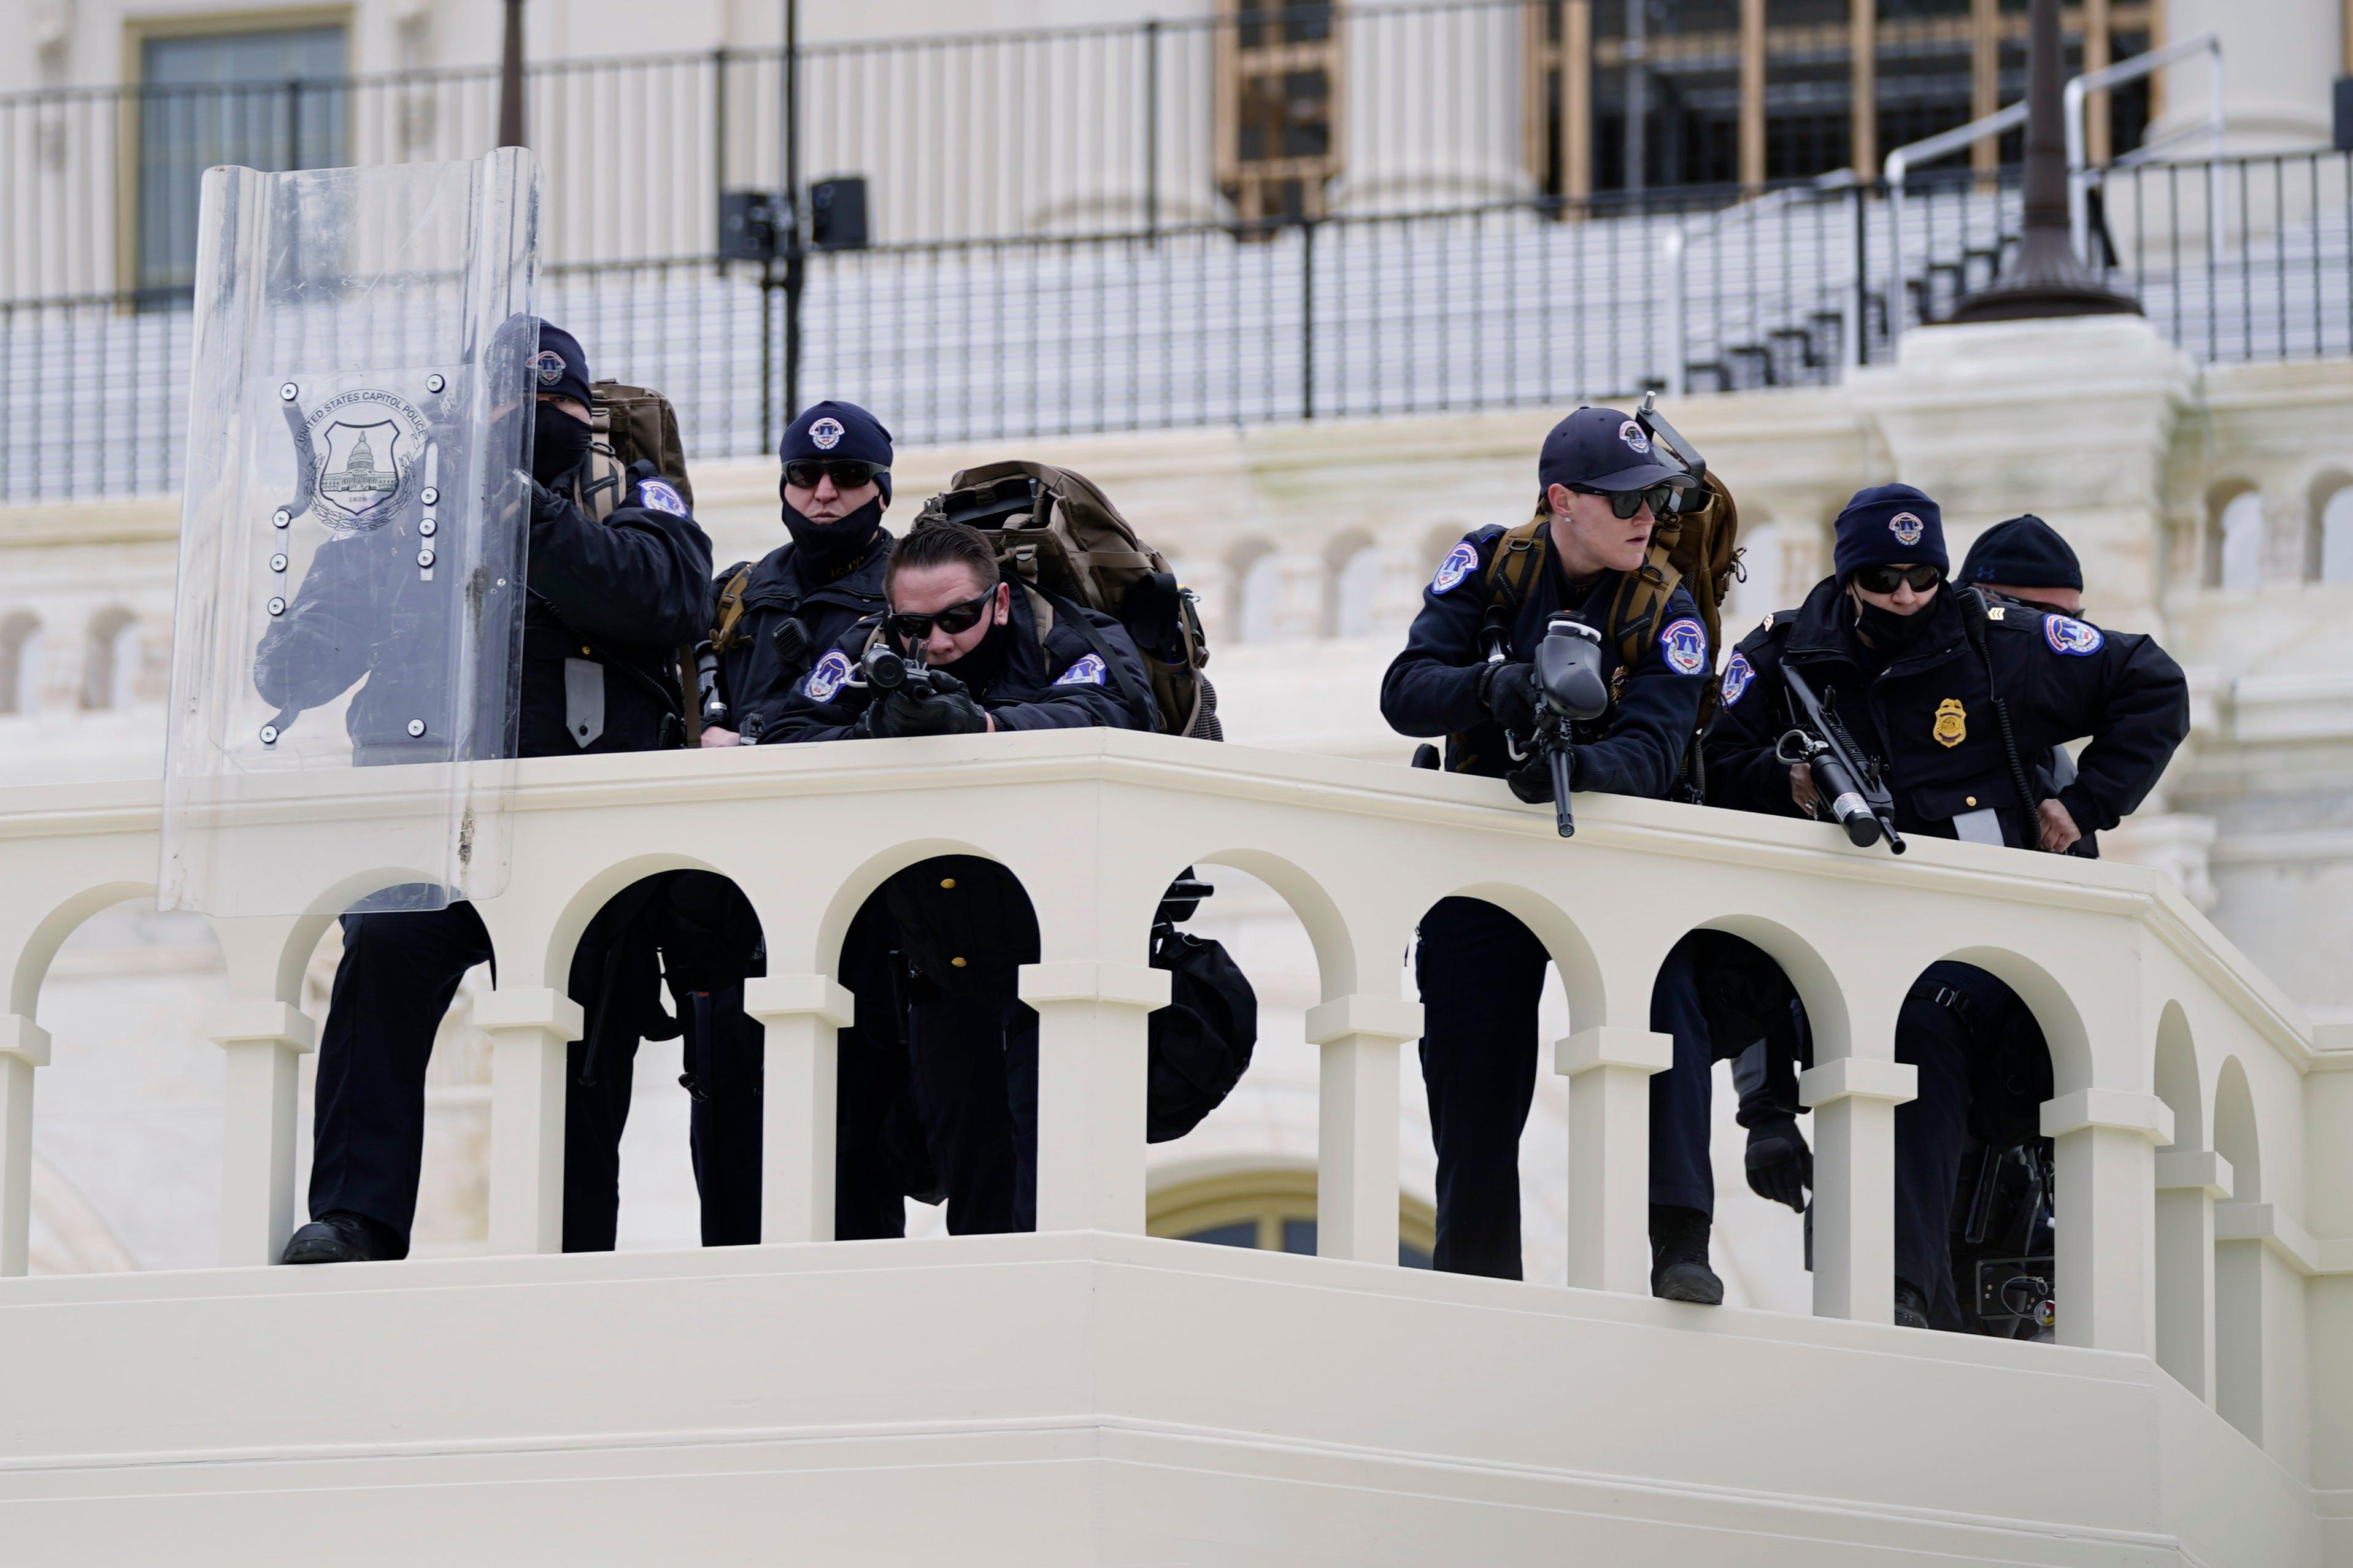 Report: Broad missteps left Capitol Police unprepared Jan. 6 2